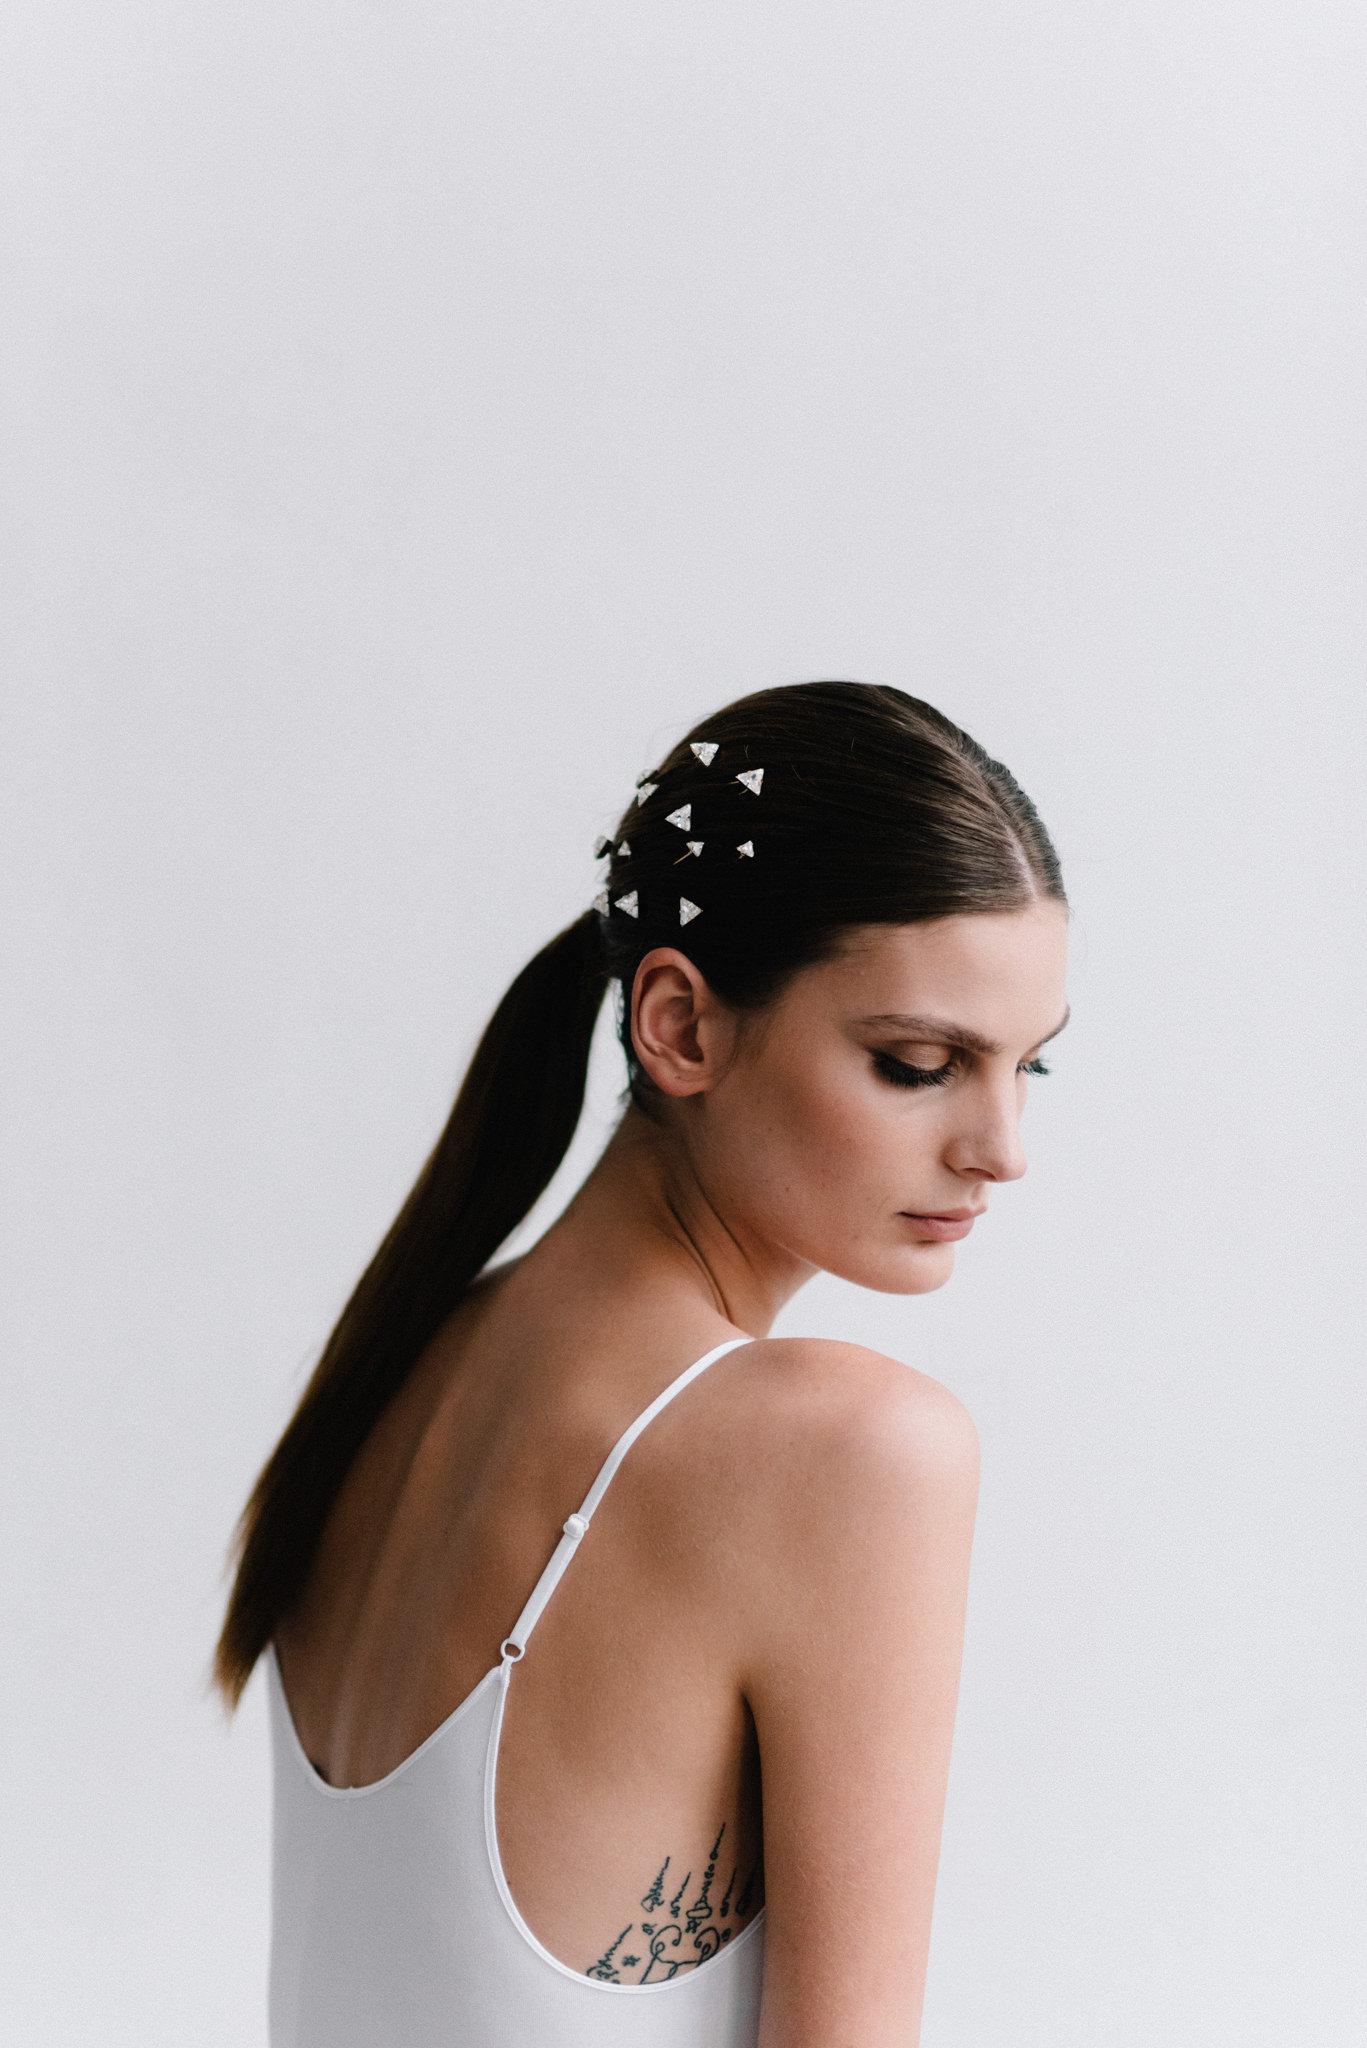 parisian-inspired-blog-mariagemaisonsabben-accessoires-mariee-pics-chignon-comete-5.jpg